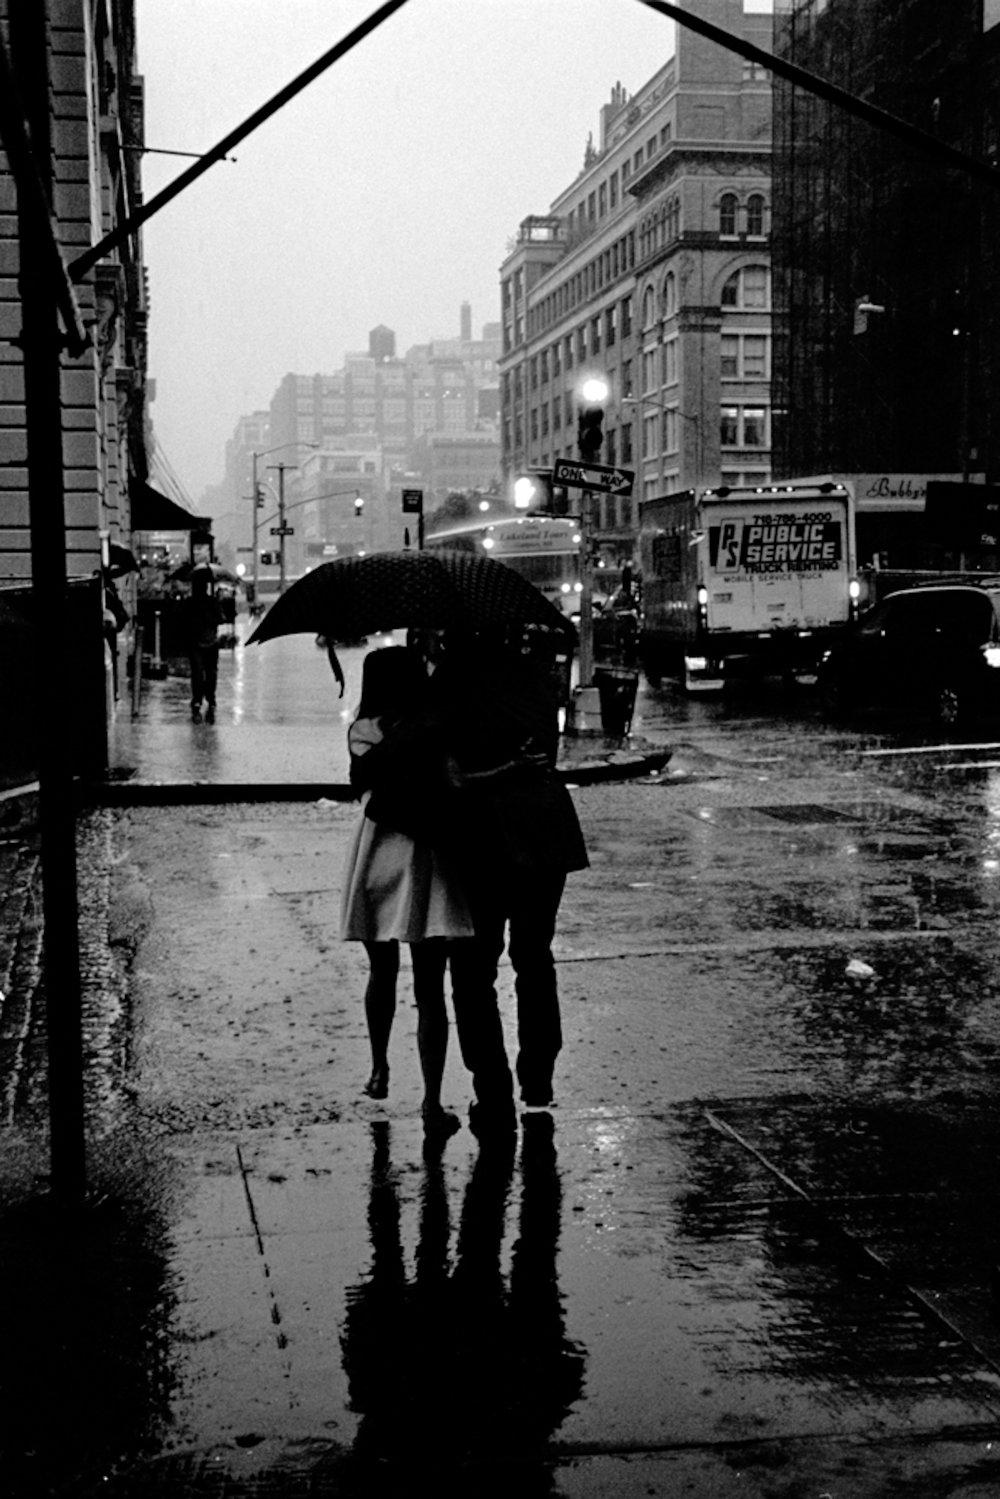 new-york-city-street-photography-Salim-Hasbini-1